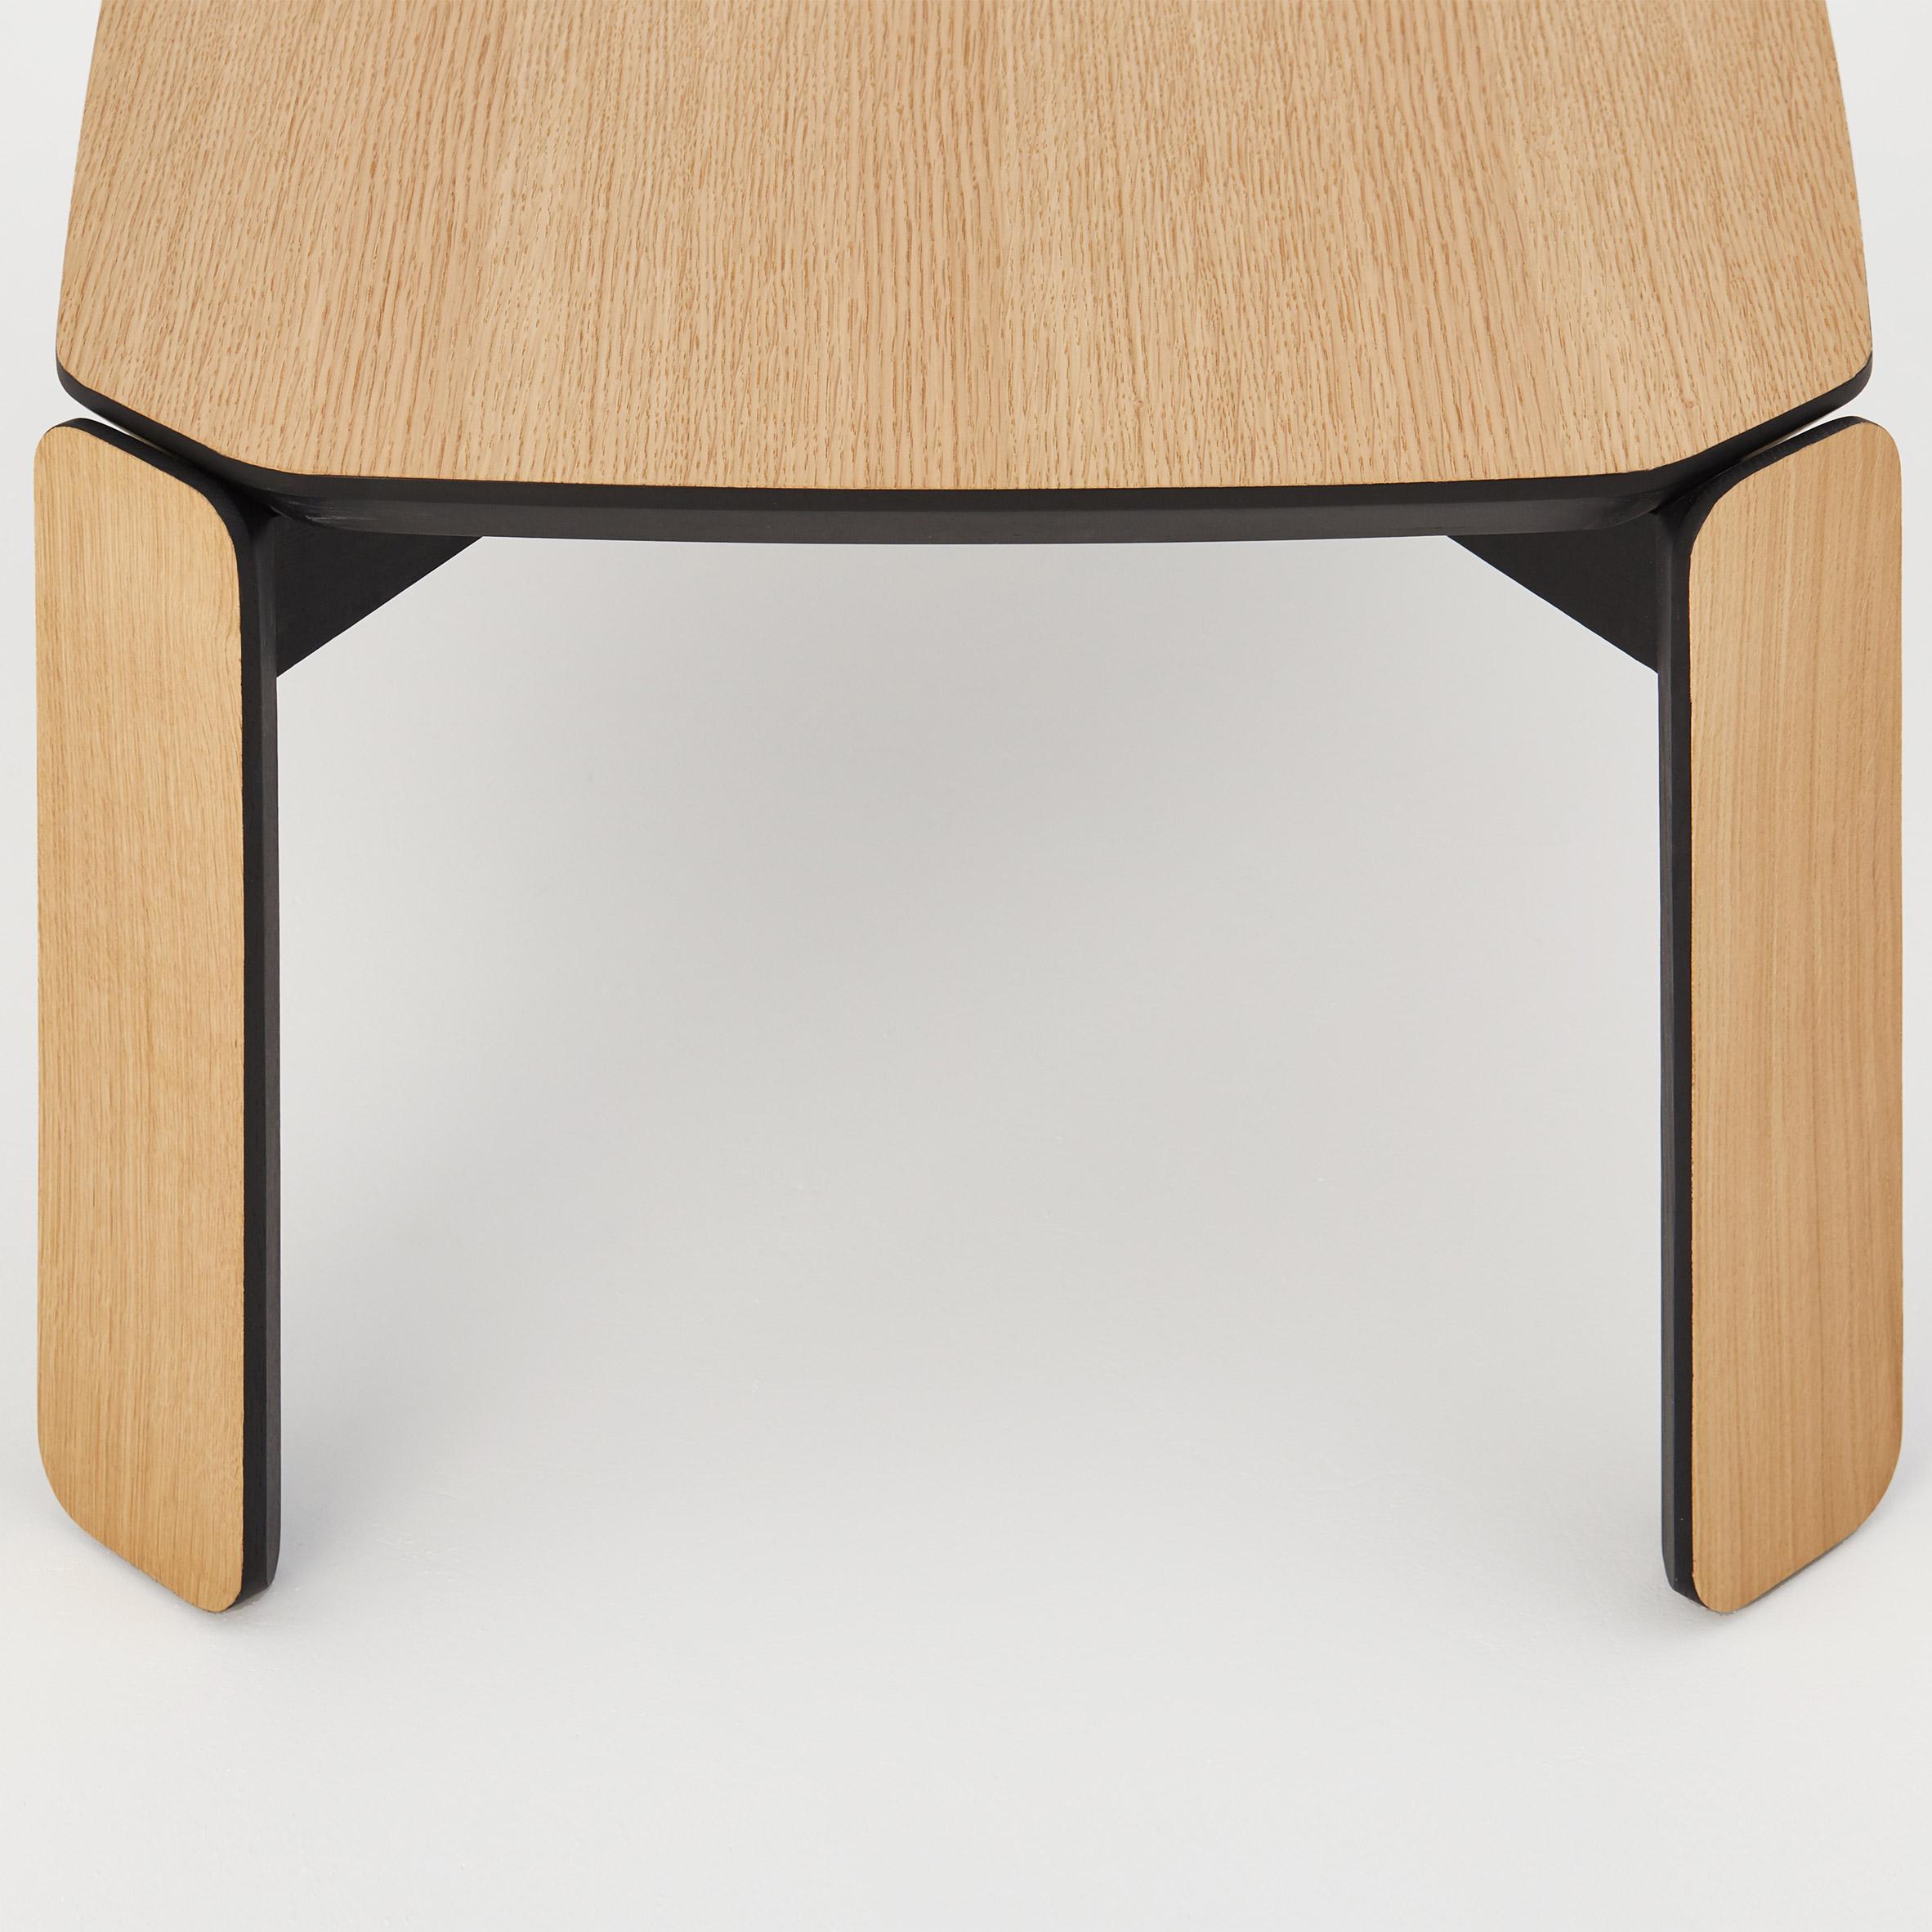 45-table-system-inyard-la-selva-design-furniture_dezeen_2364_col_3